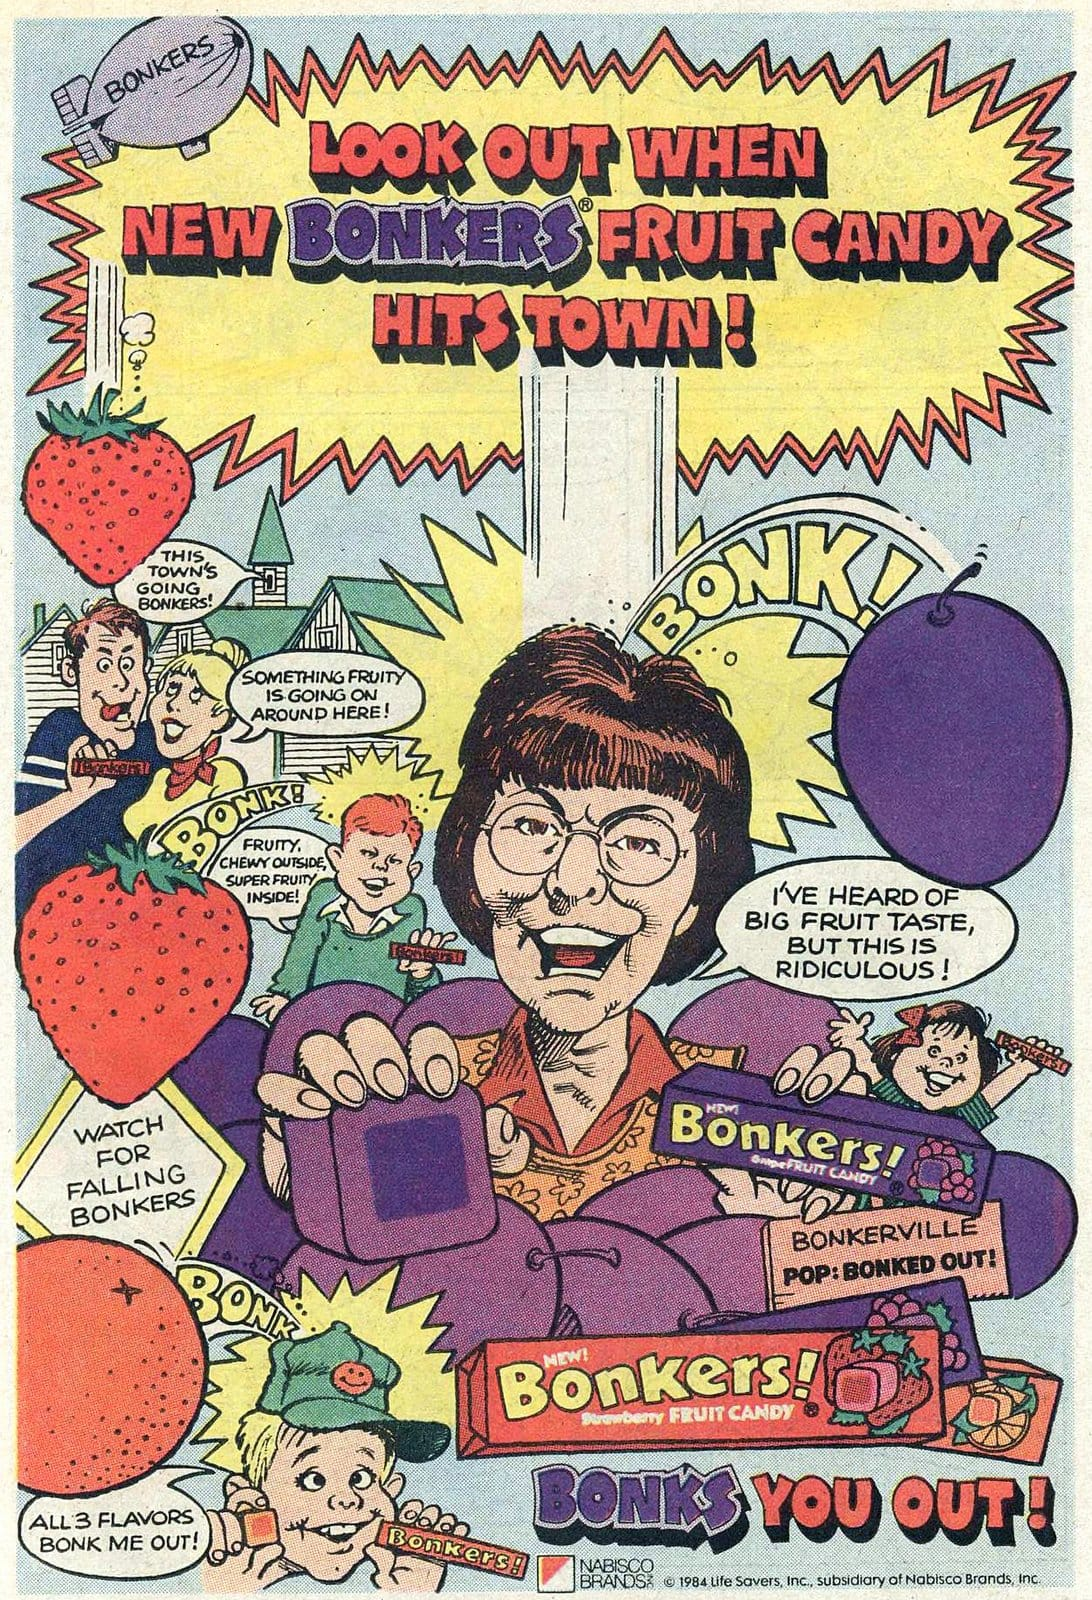 Retro Bonkers fruit candy (1986)